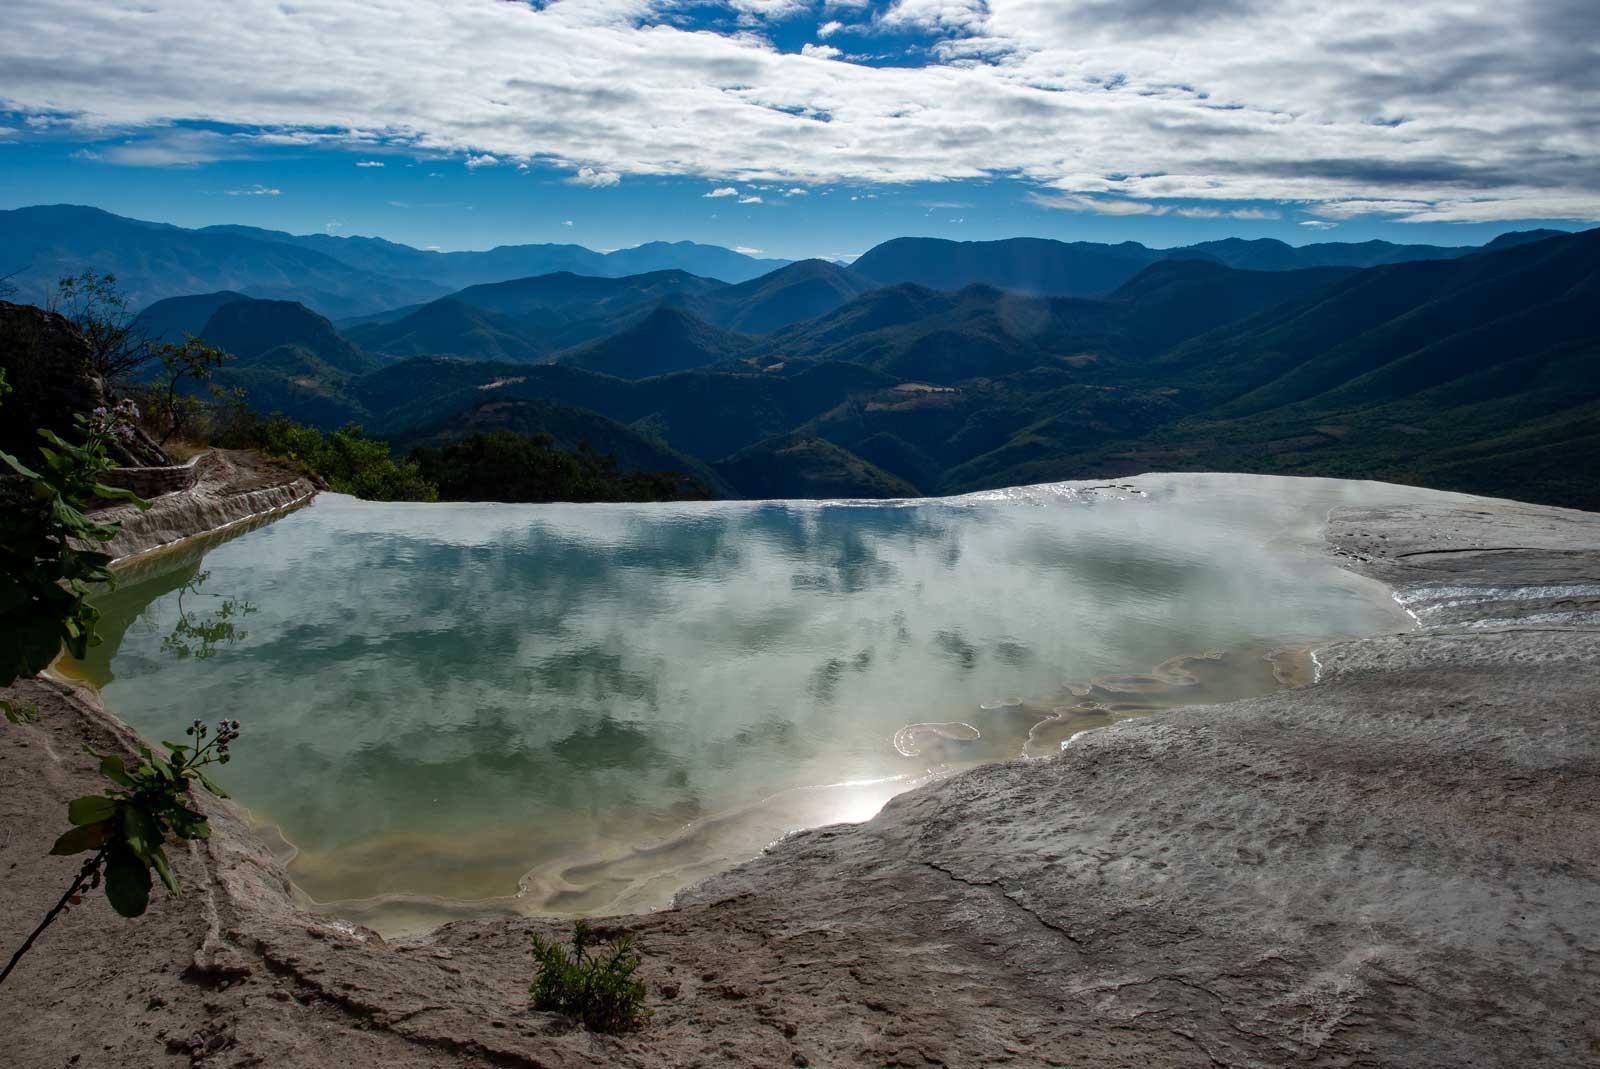 Ausblick über die Berglandschaft Oaxacas